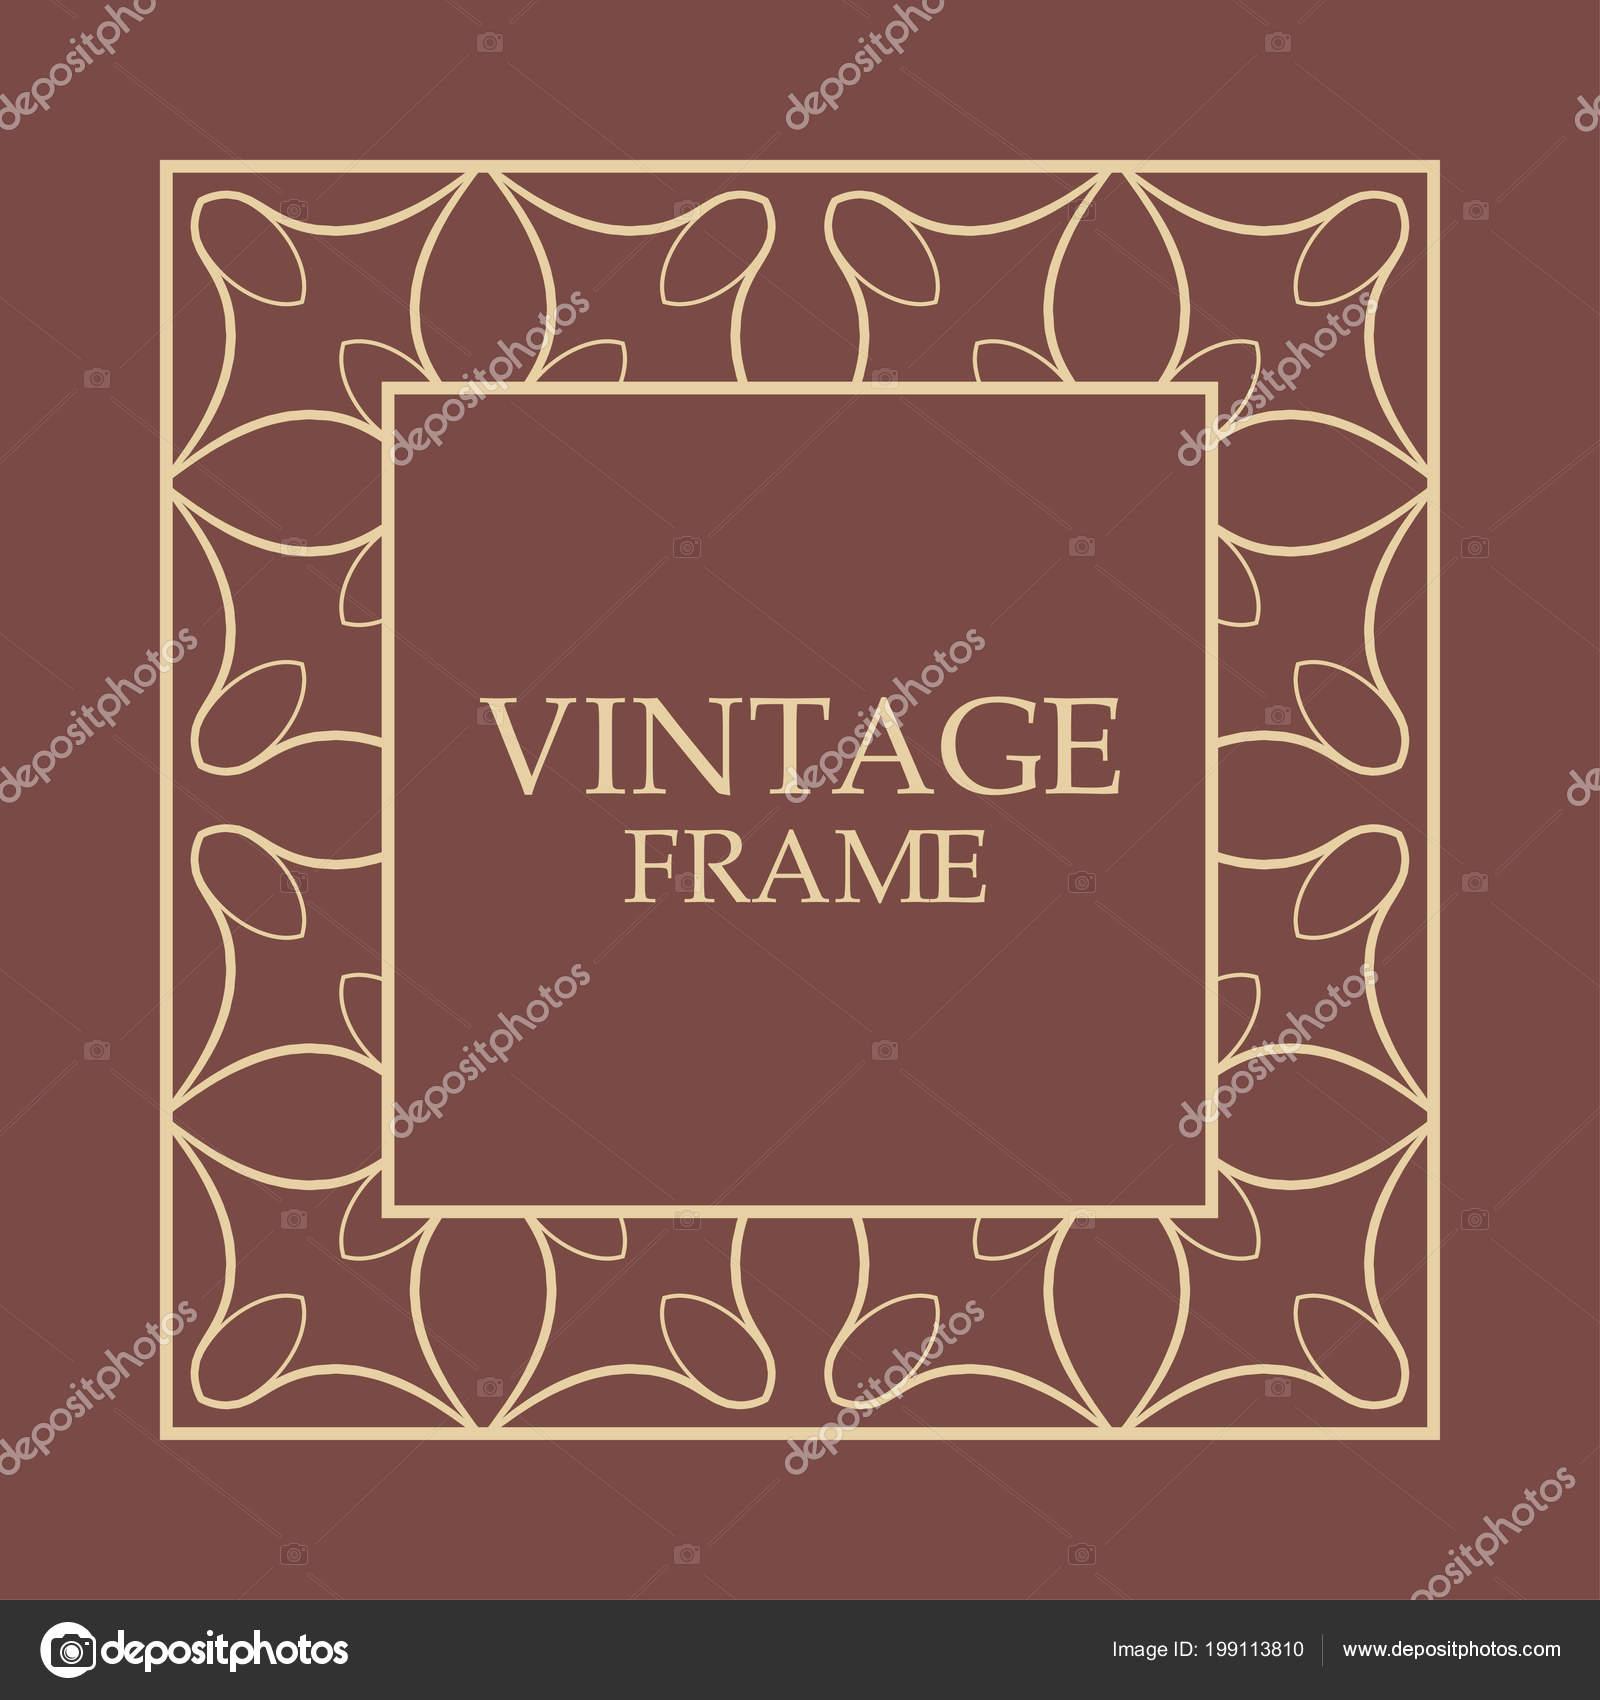 Vintage decorative frame — Stock Vector © Artstockstudia #199113810